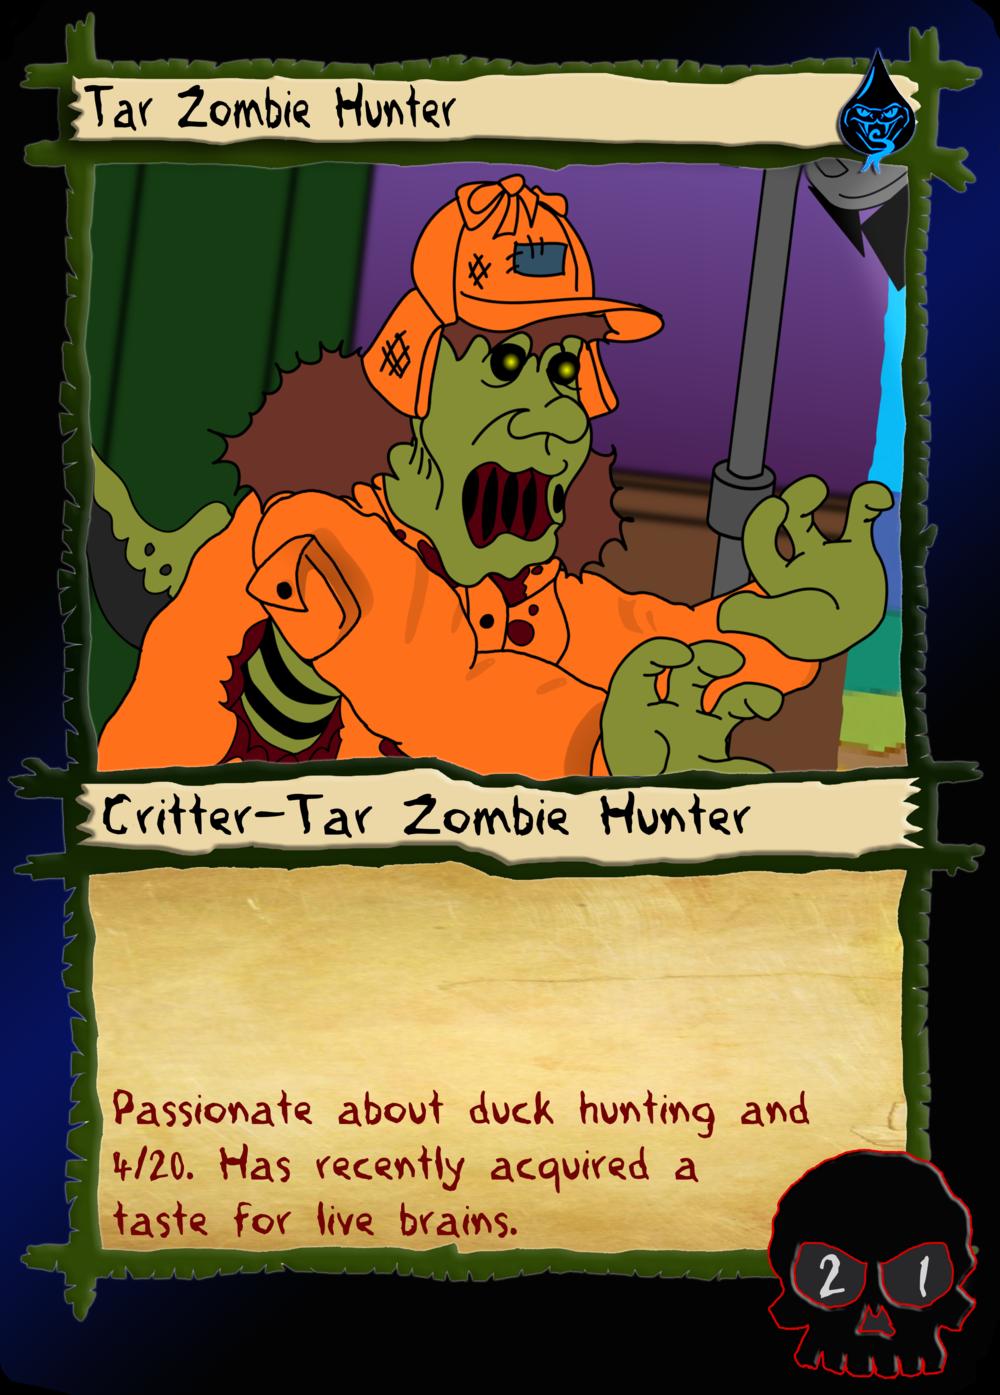 35_Tar Zombie Hunter.png